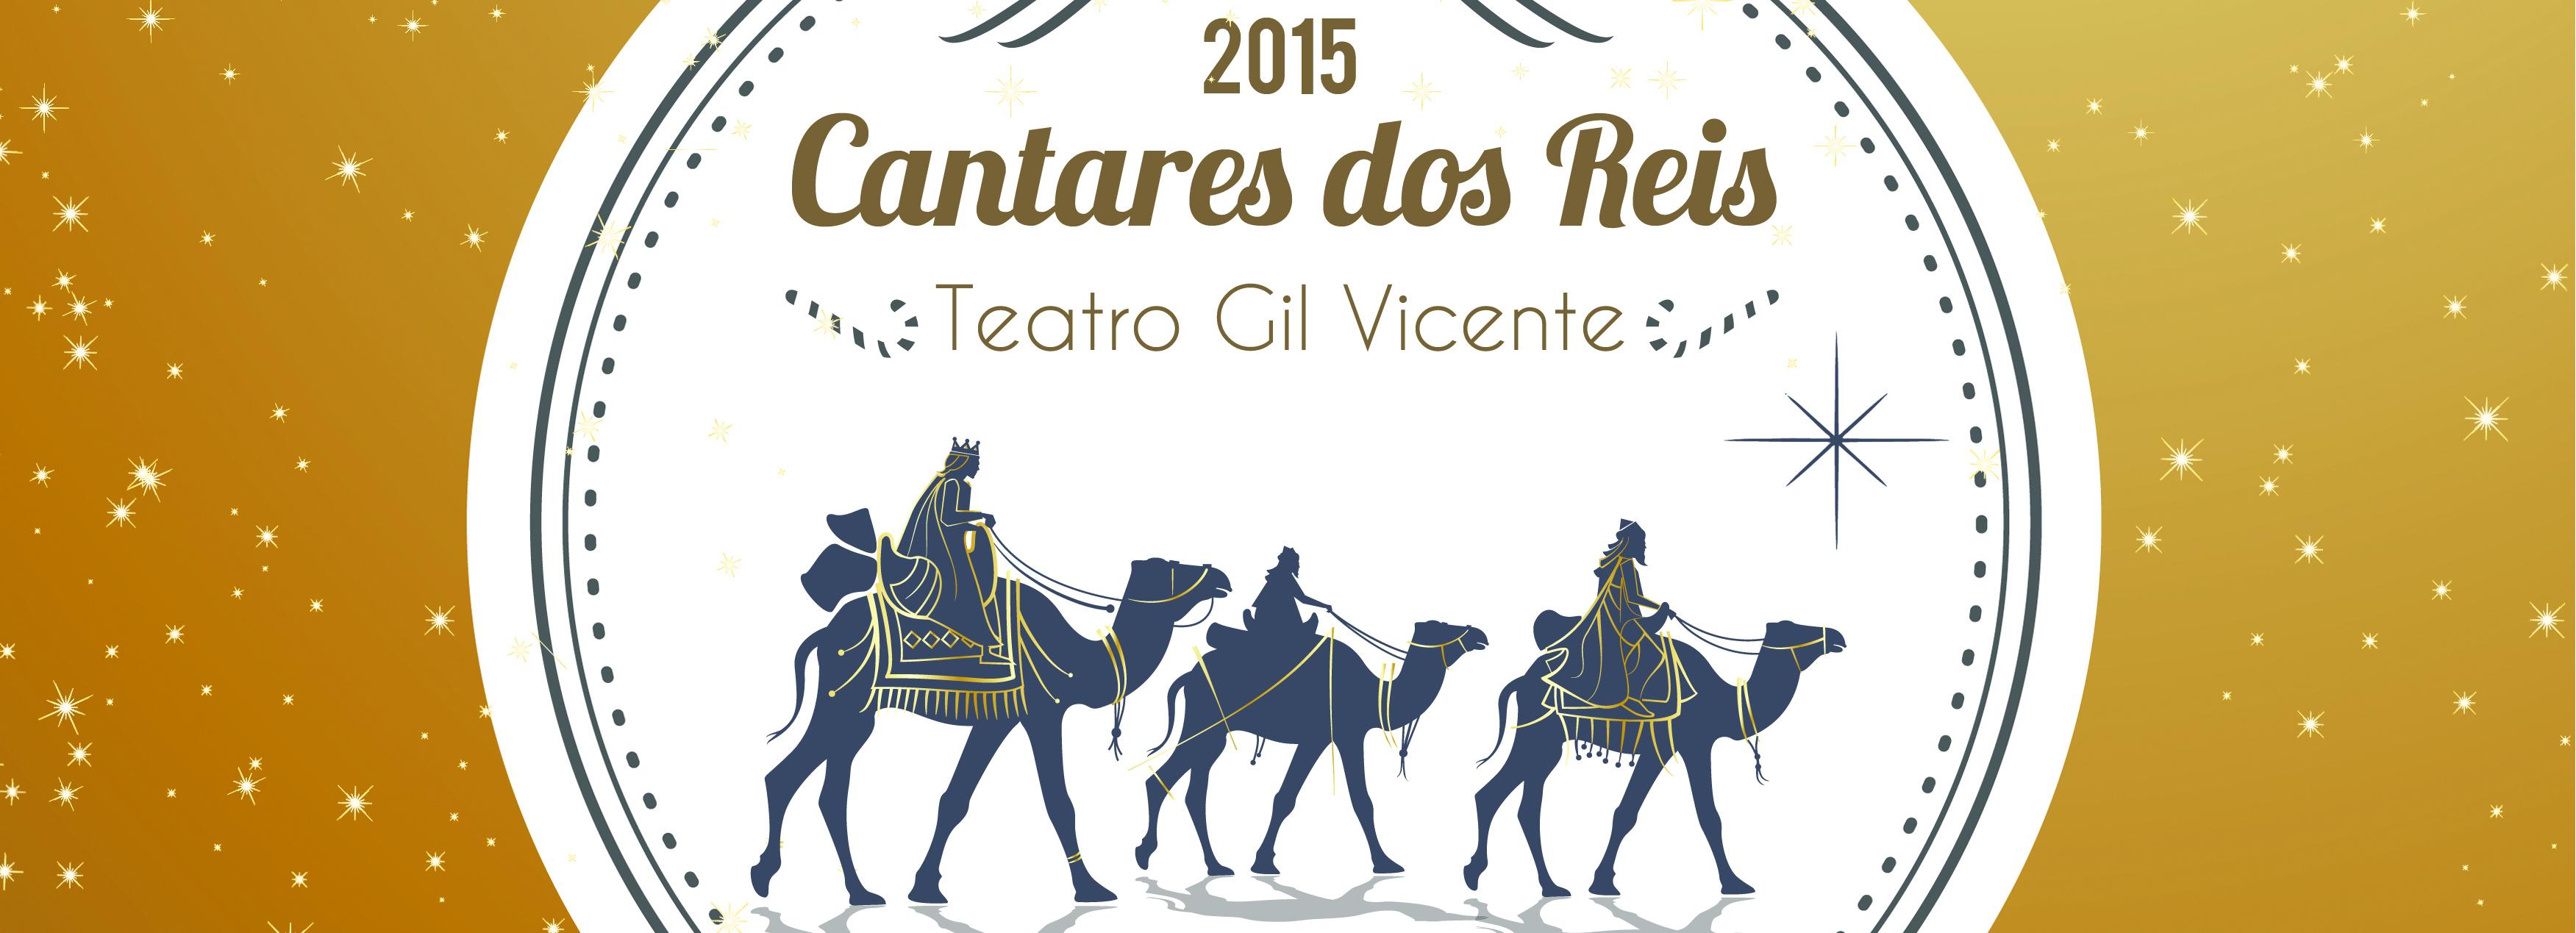 Cantares dos Reis e Concerto de Ano Novo  no Teatro Gil Vicente